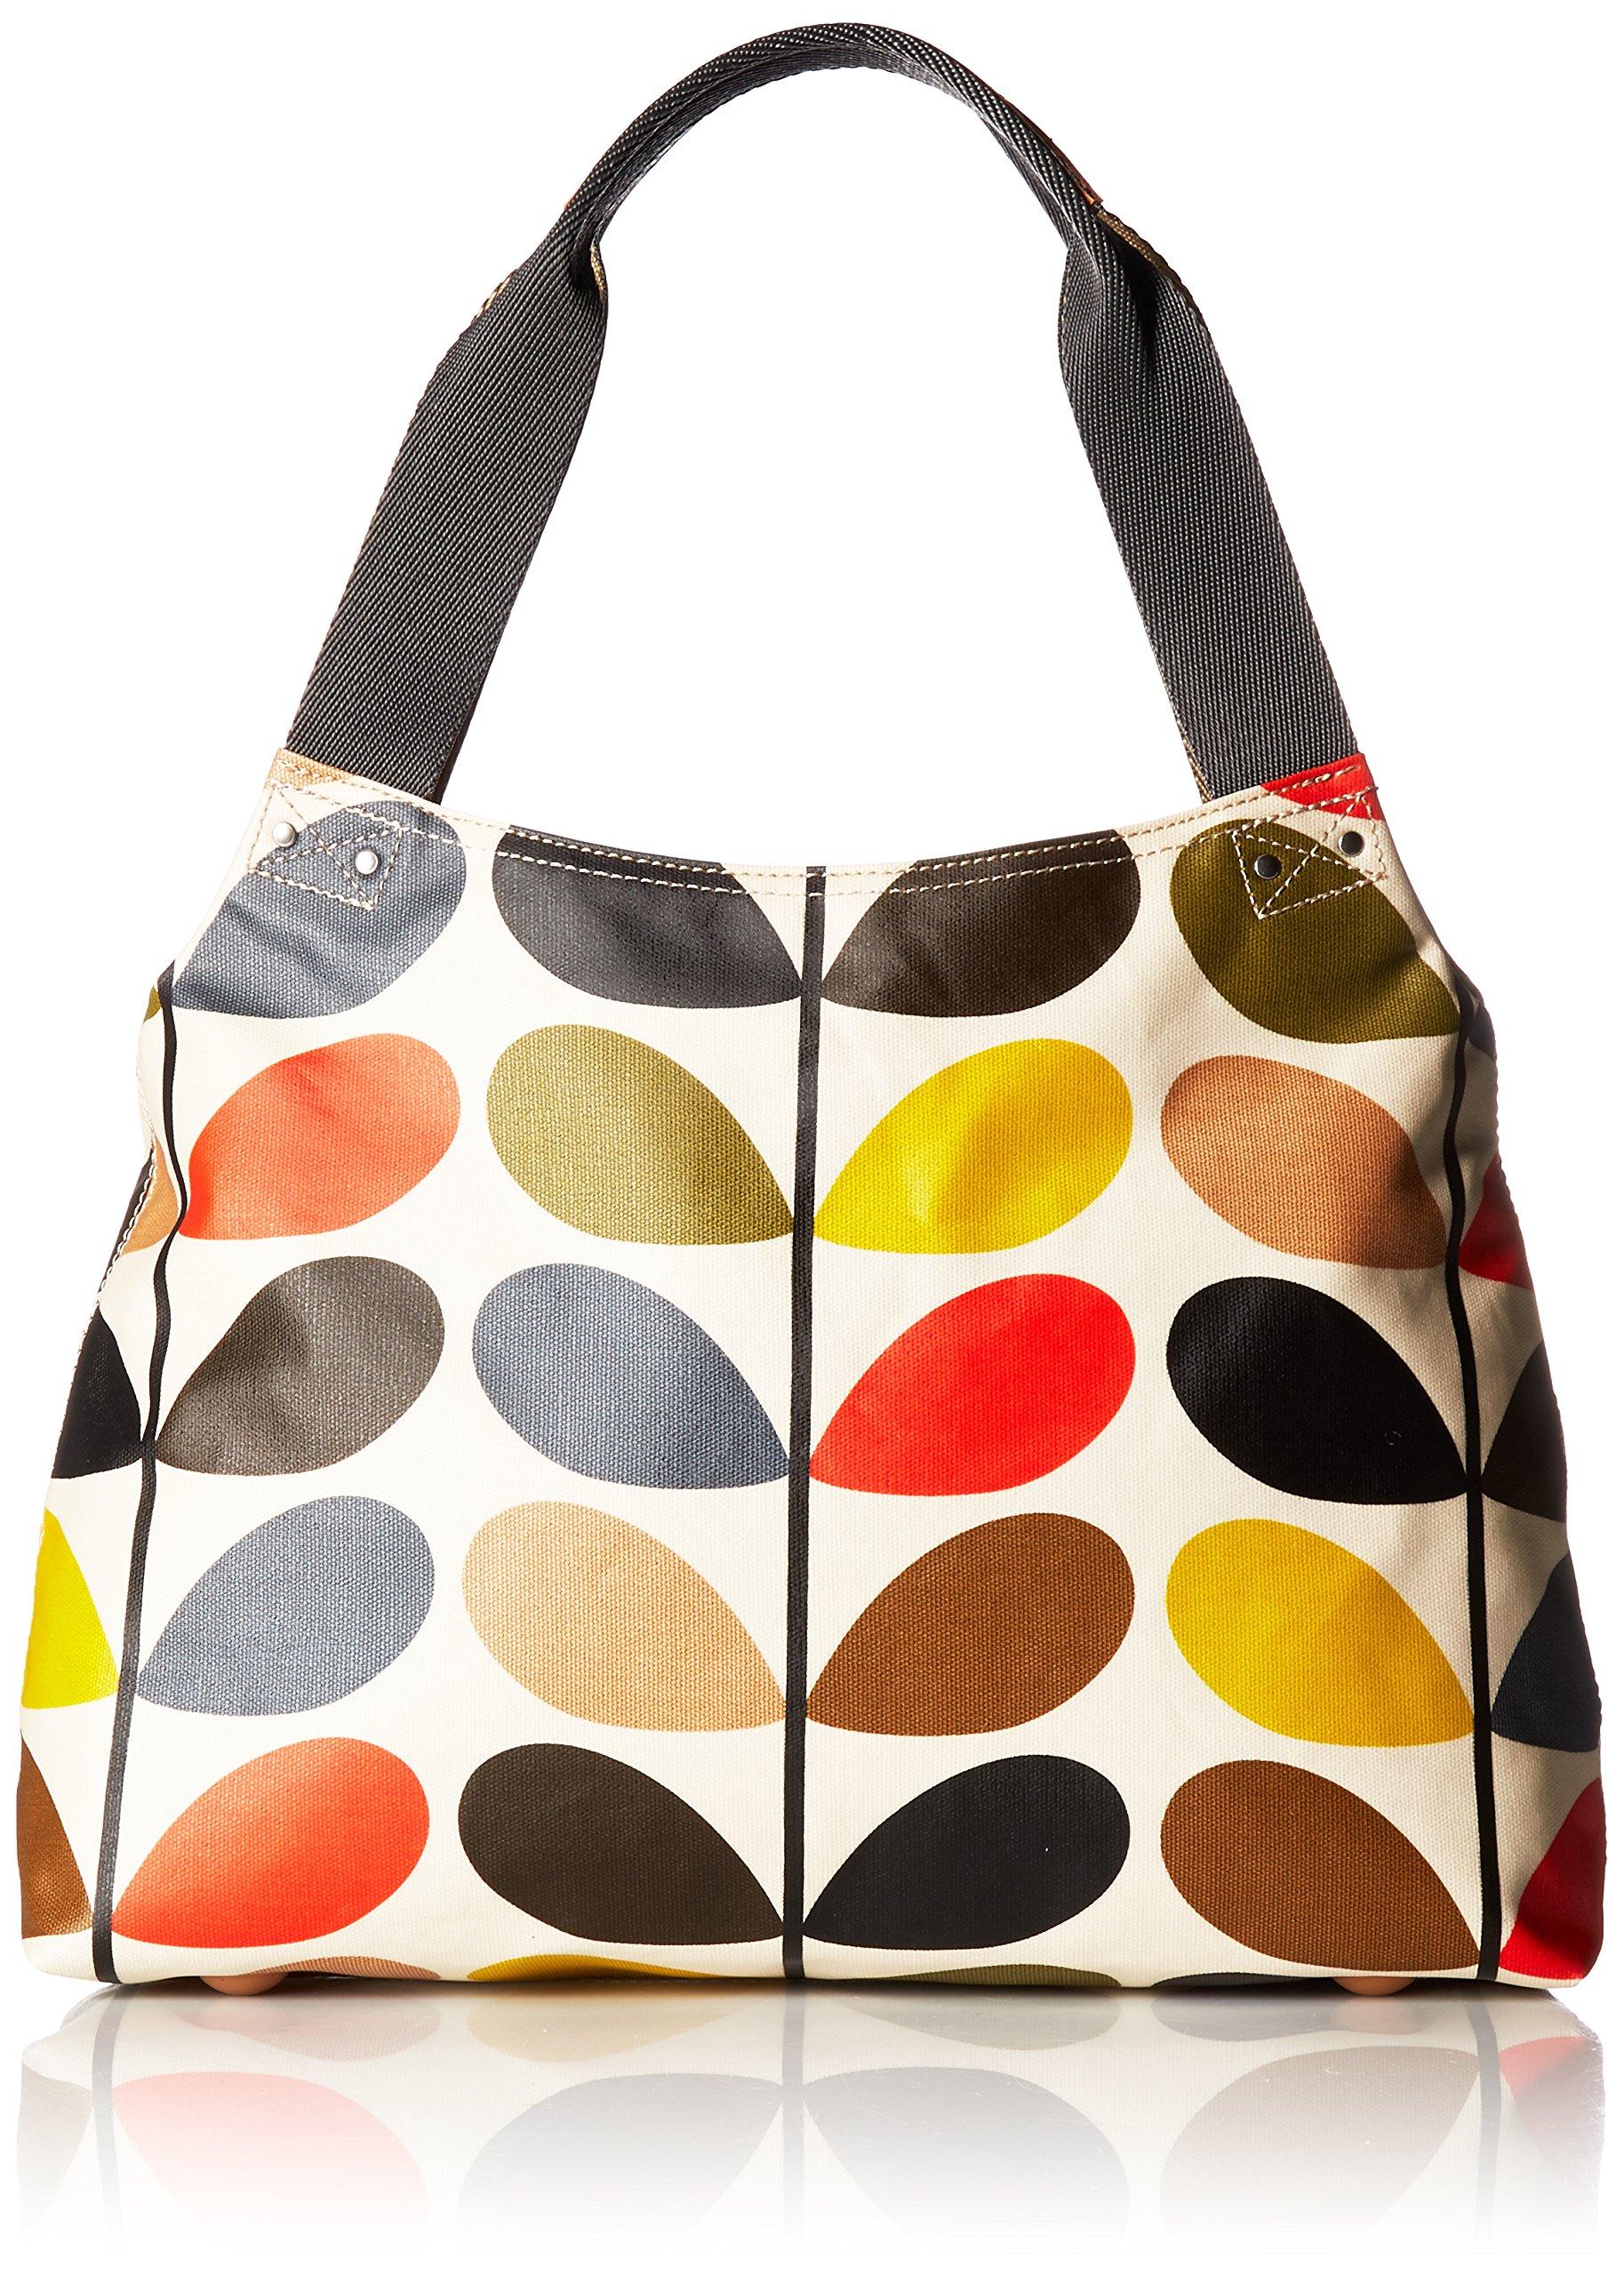 Orla Kiely Classic Multi Stem Shoulder Bag, Multi, One Size